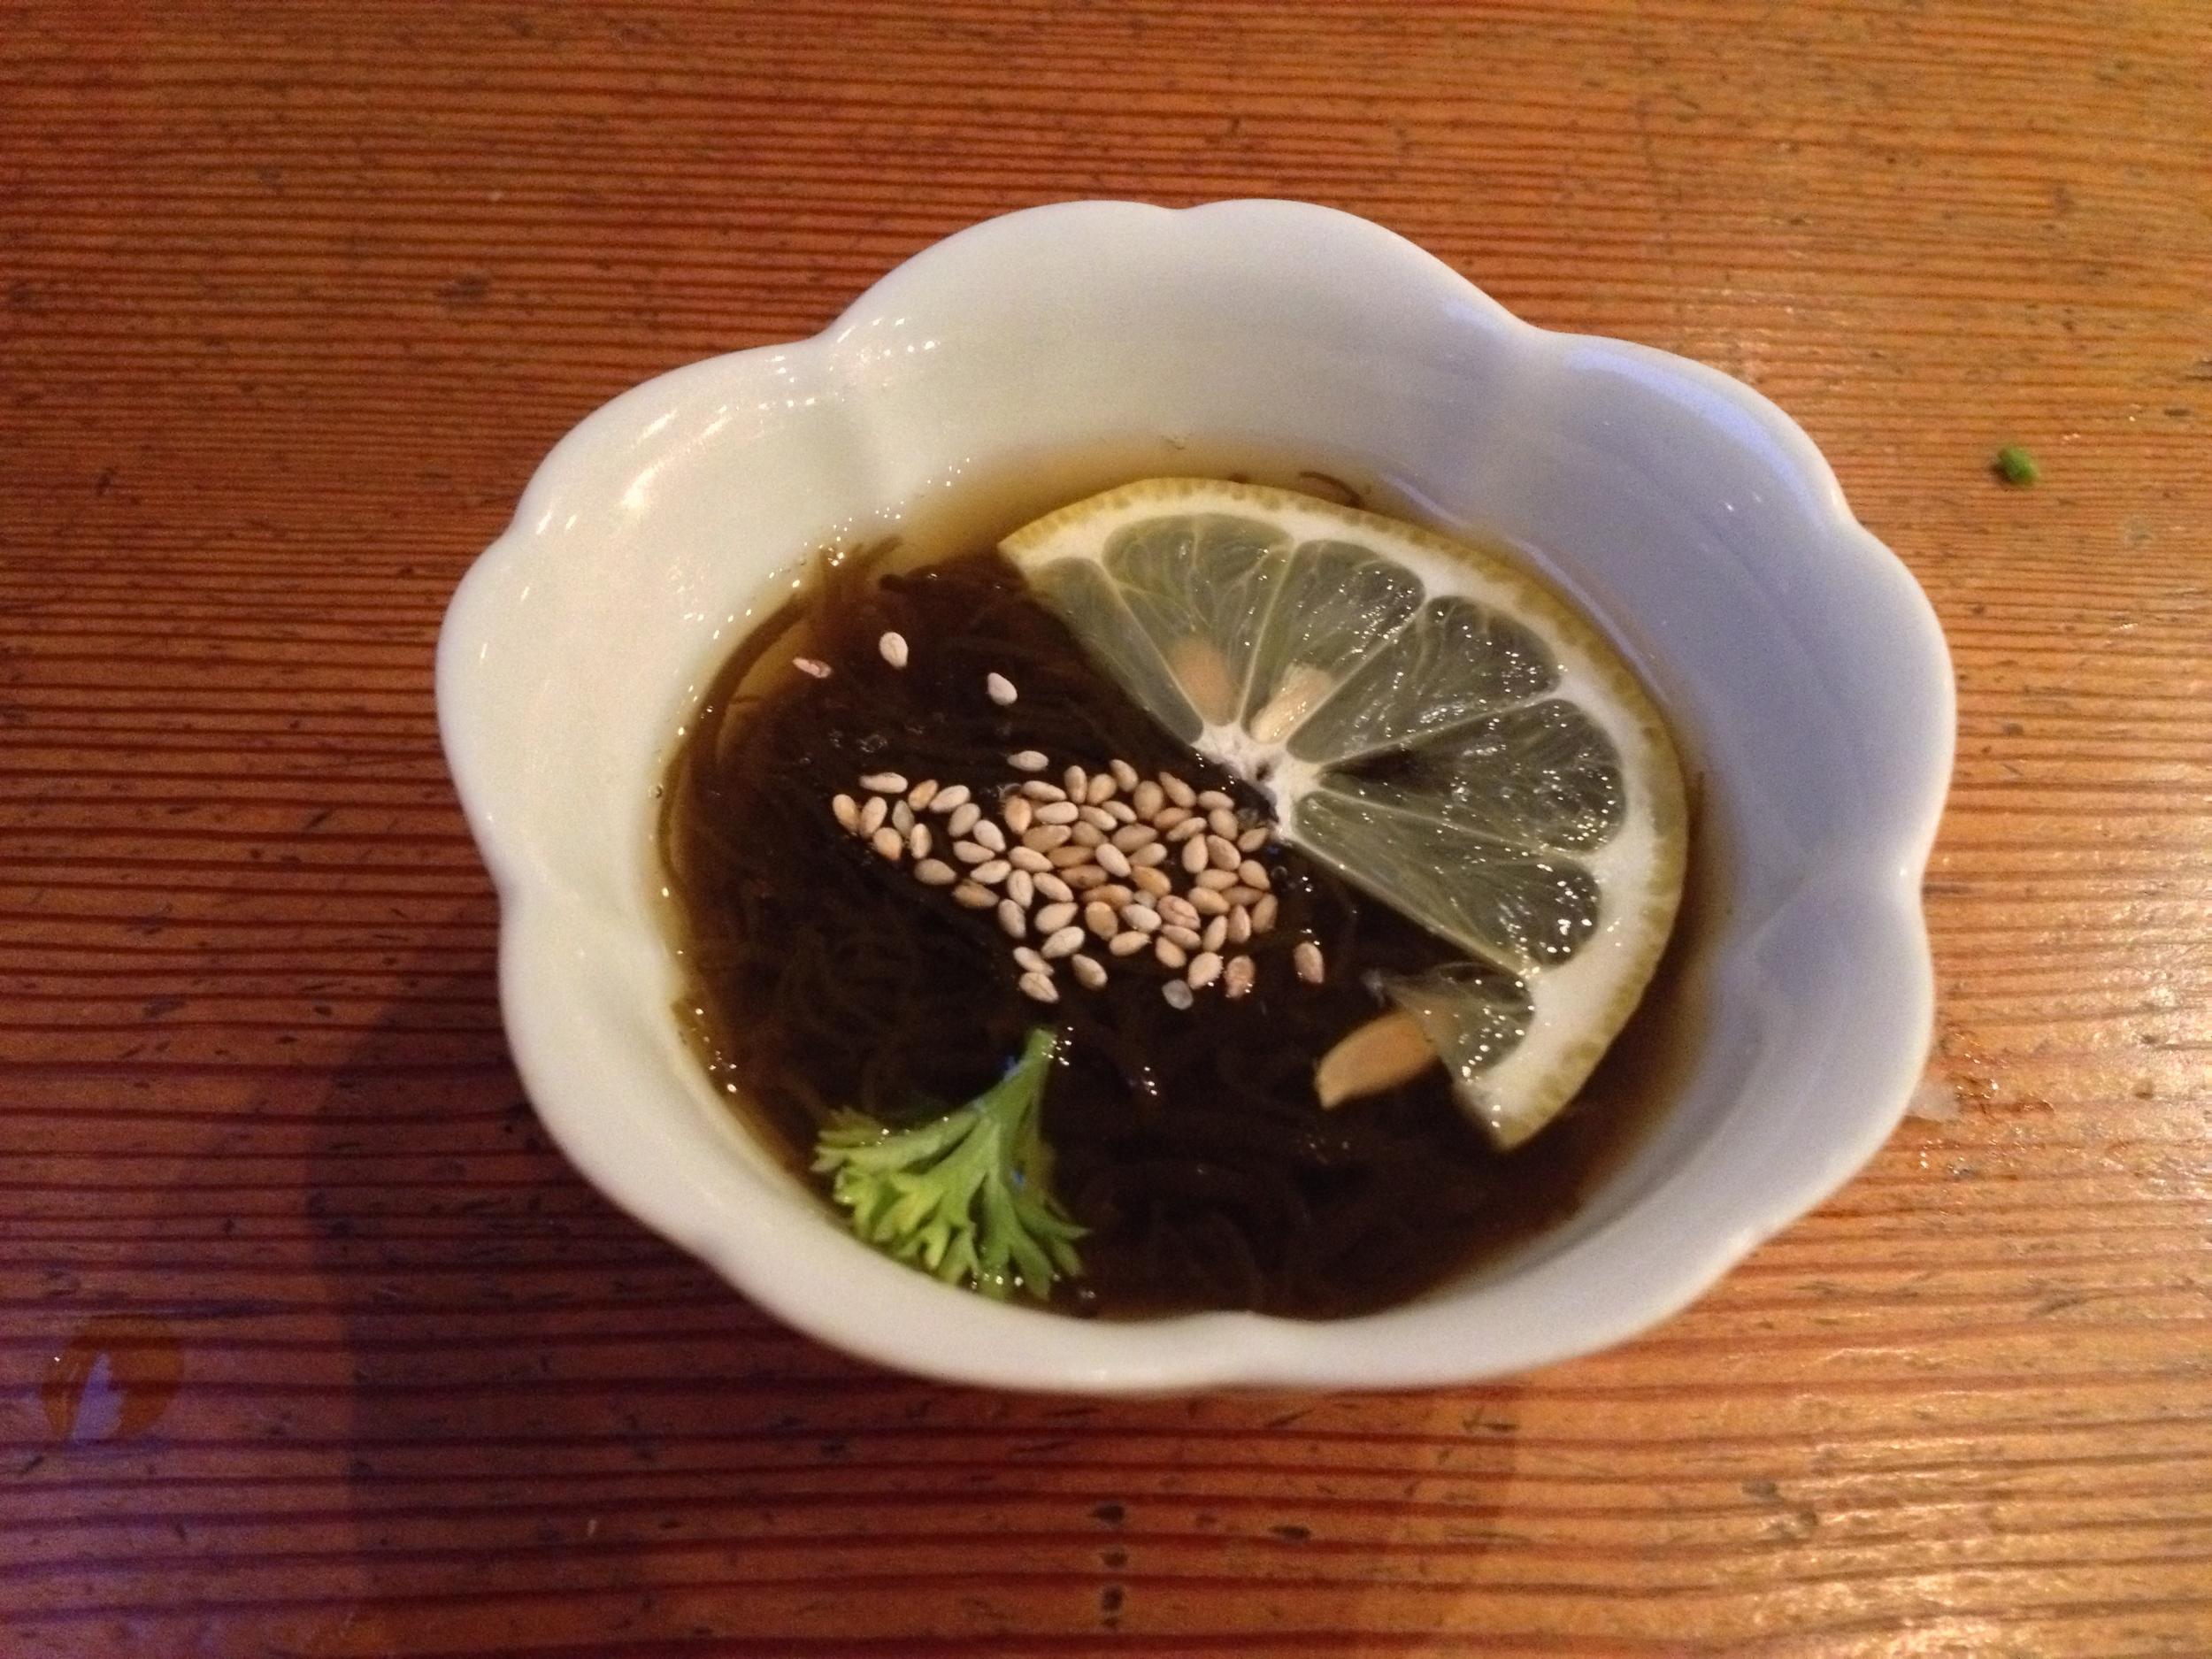 Sunomono (seaweed and cucumber in a vinegar sauce)